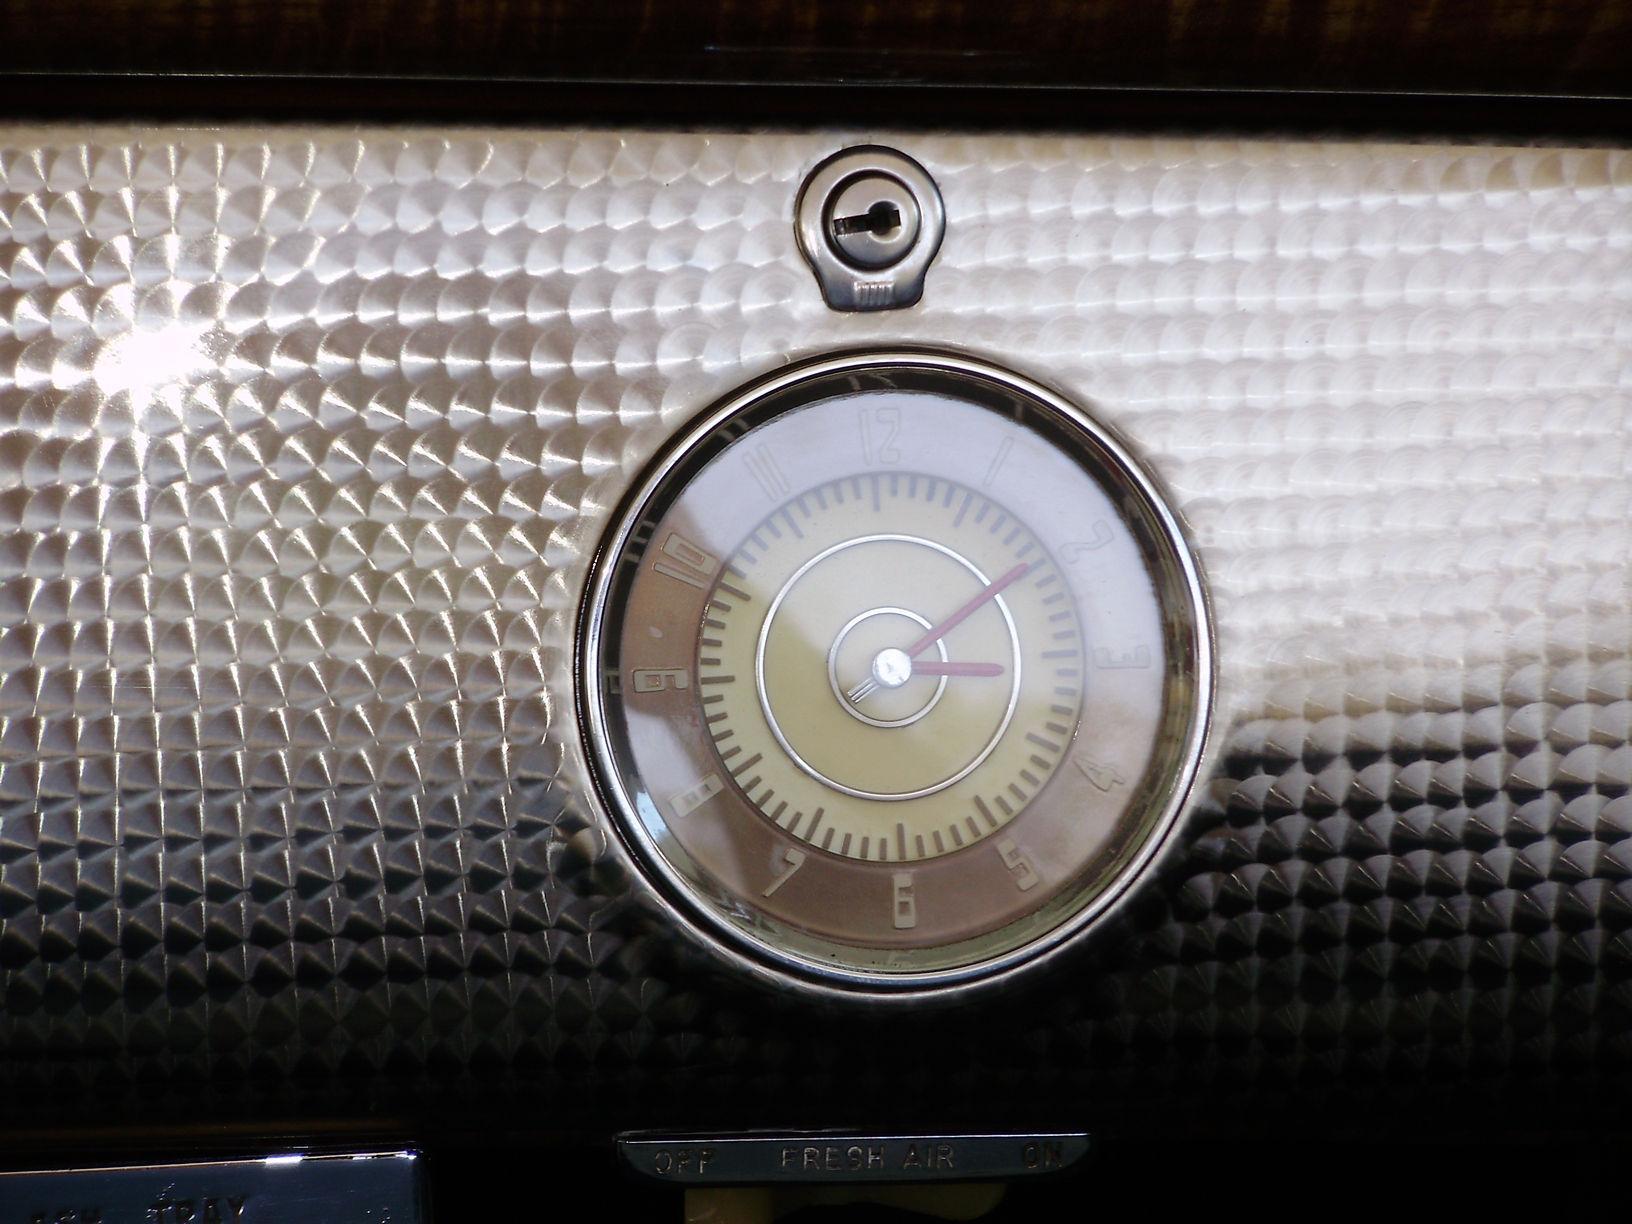 1940 BUICK CENTURY CONVERTIBLE SEDAN - Vintage Motors of Sarasota Inc. #29